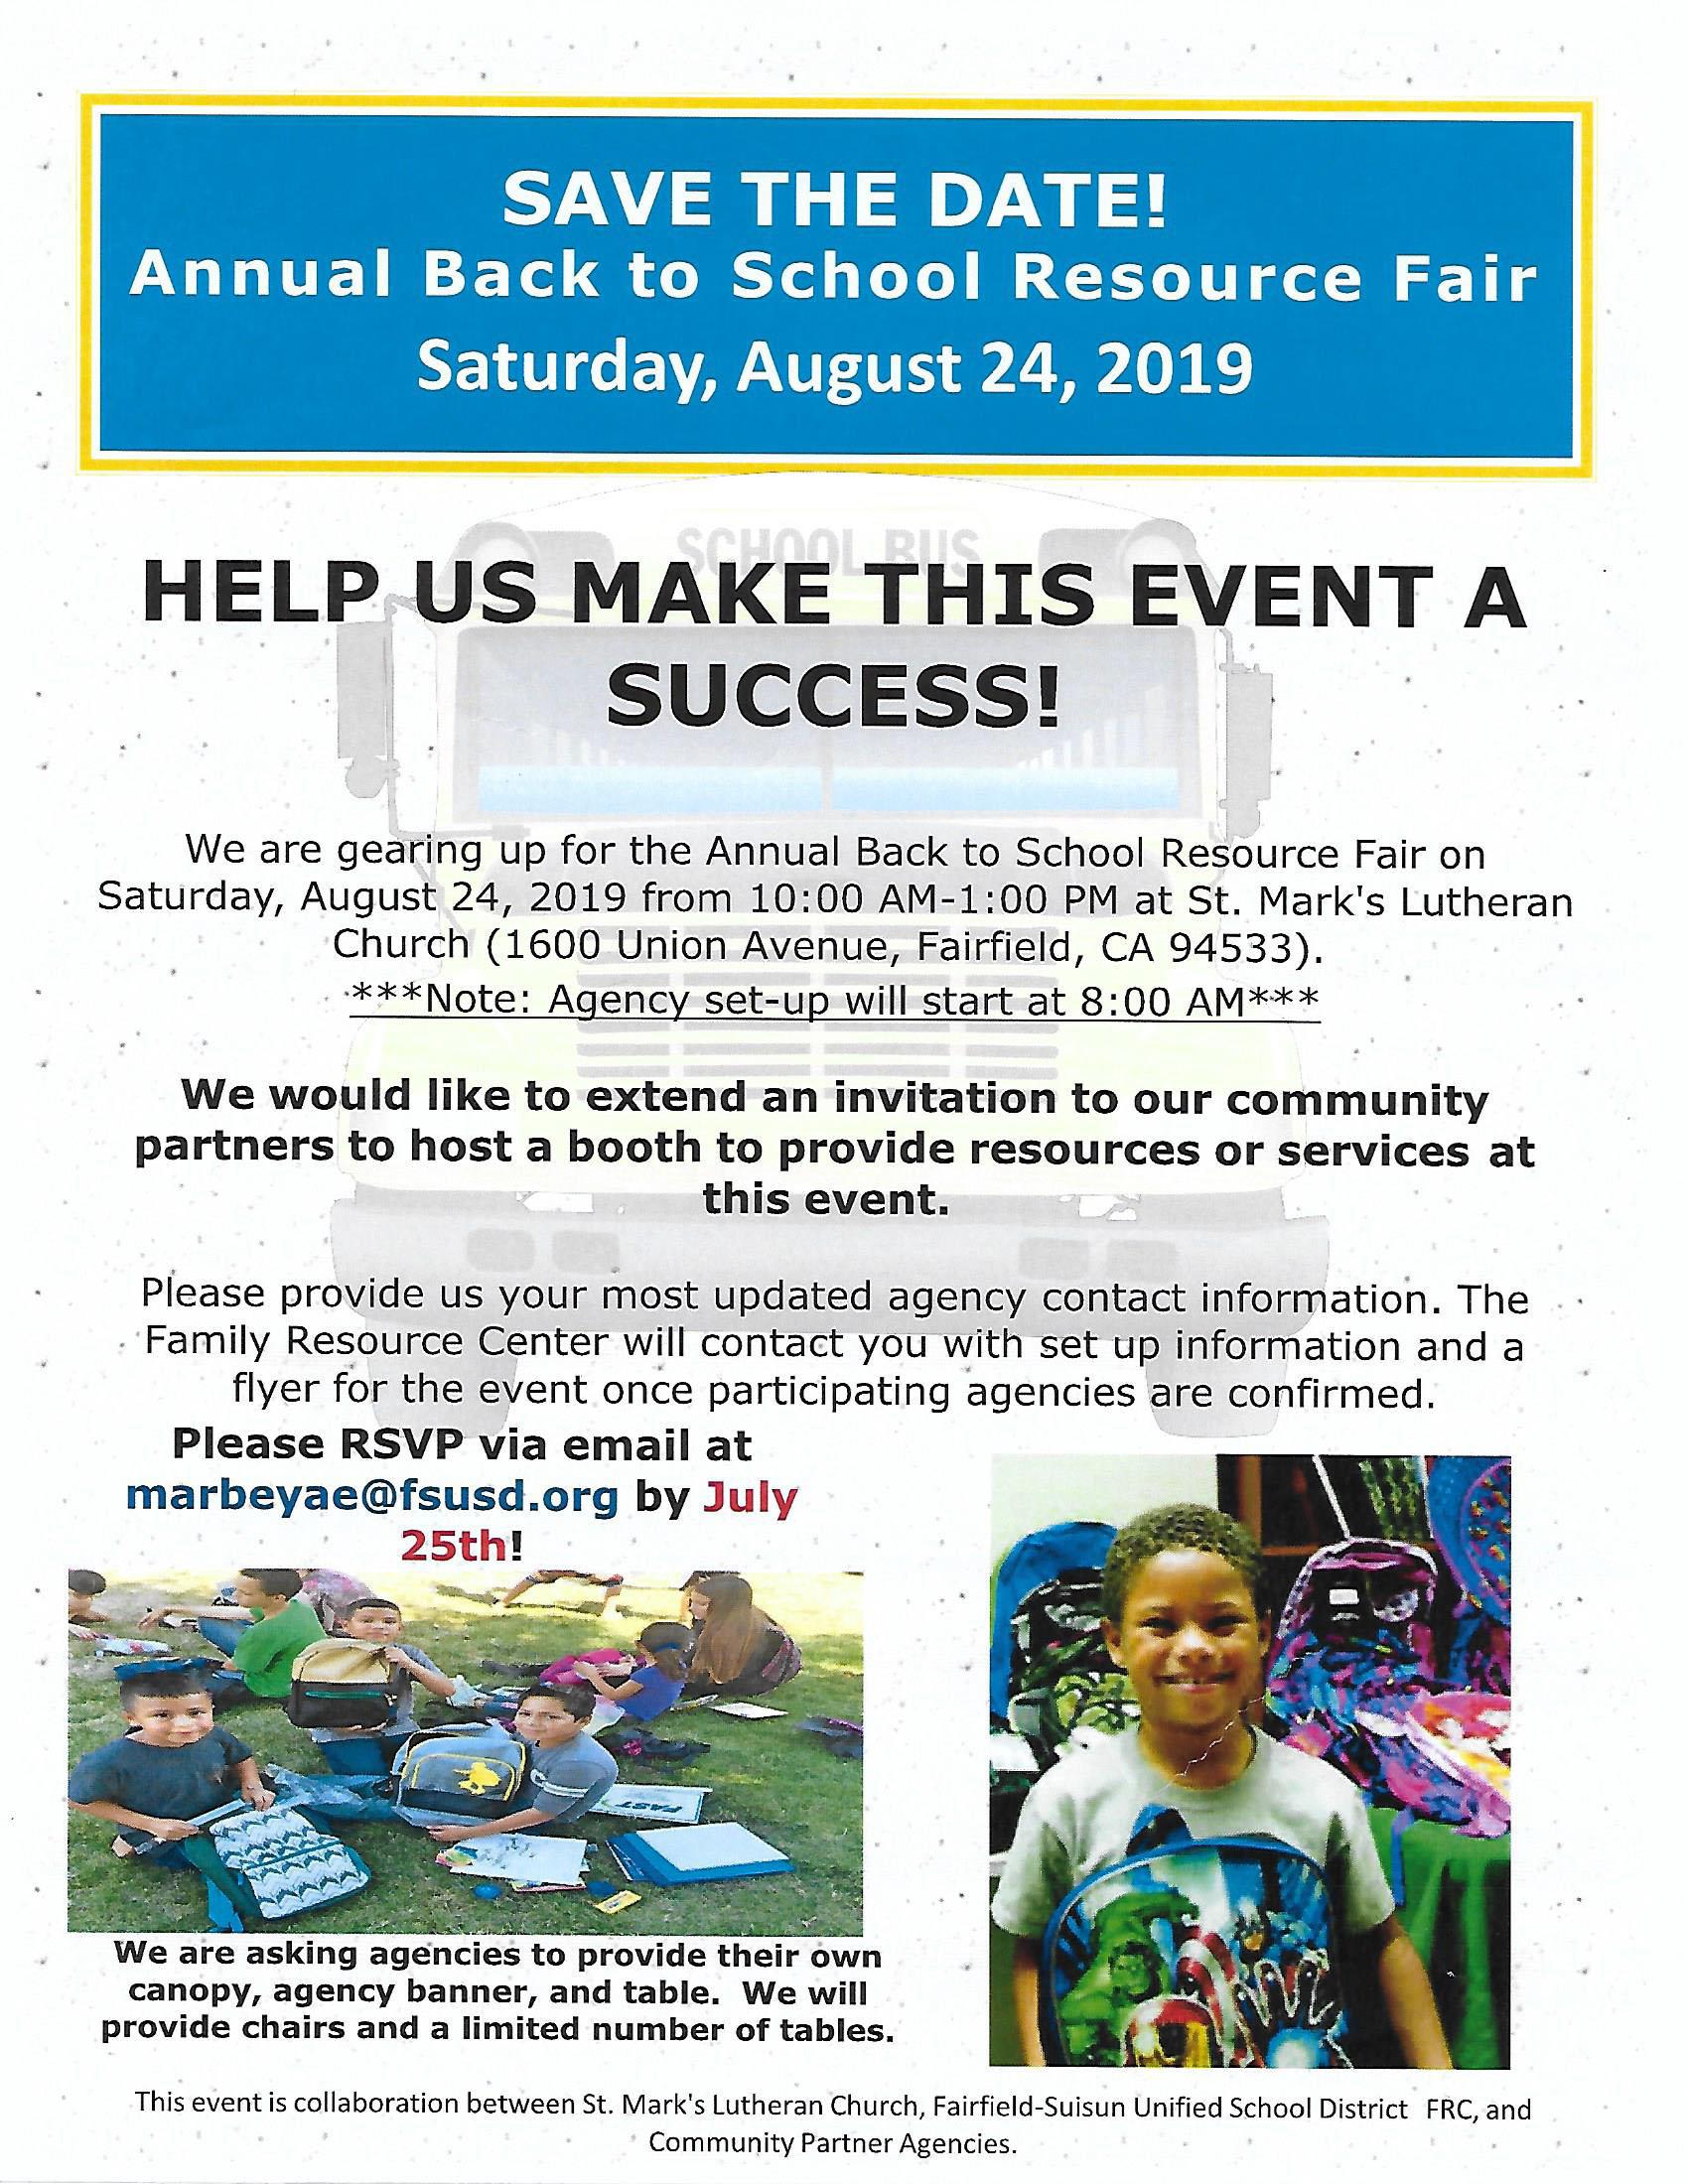 Annual Back to School Resource Fair - Aug 24, 2019